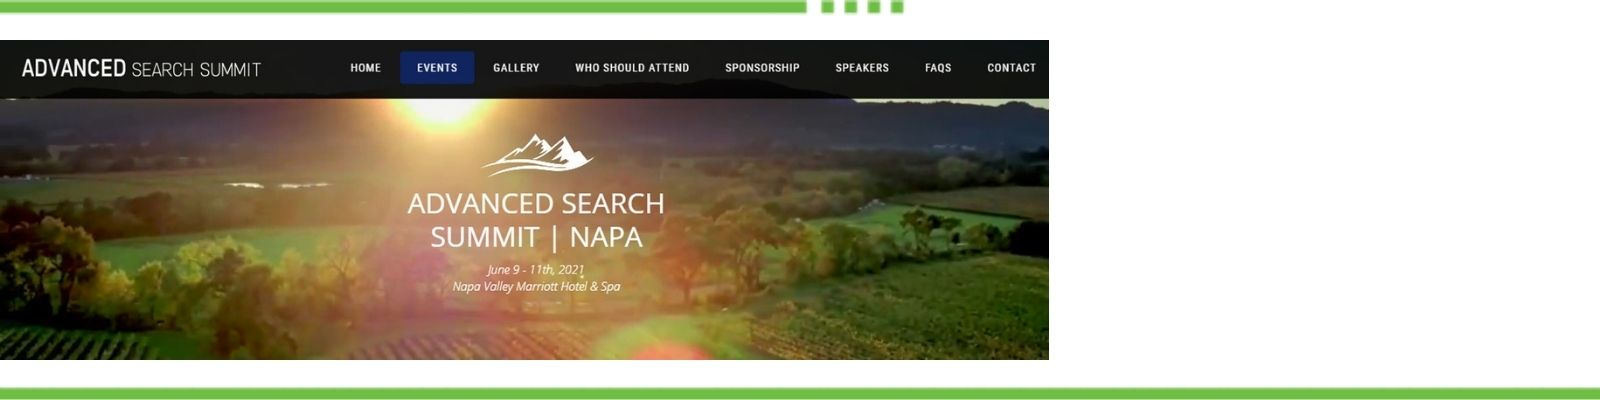 Advanced Search Summit Napa